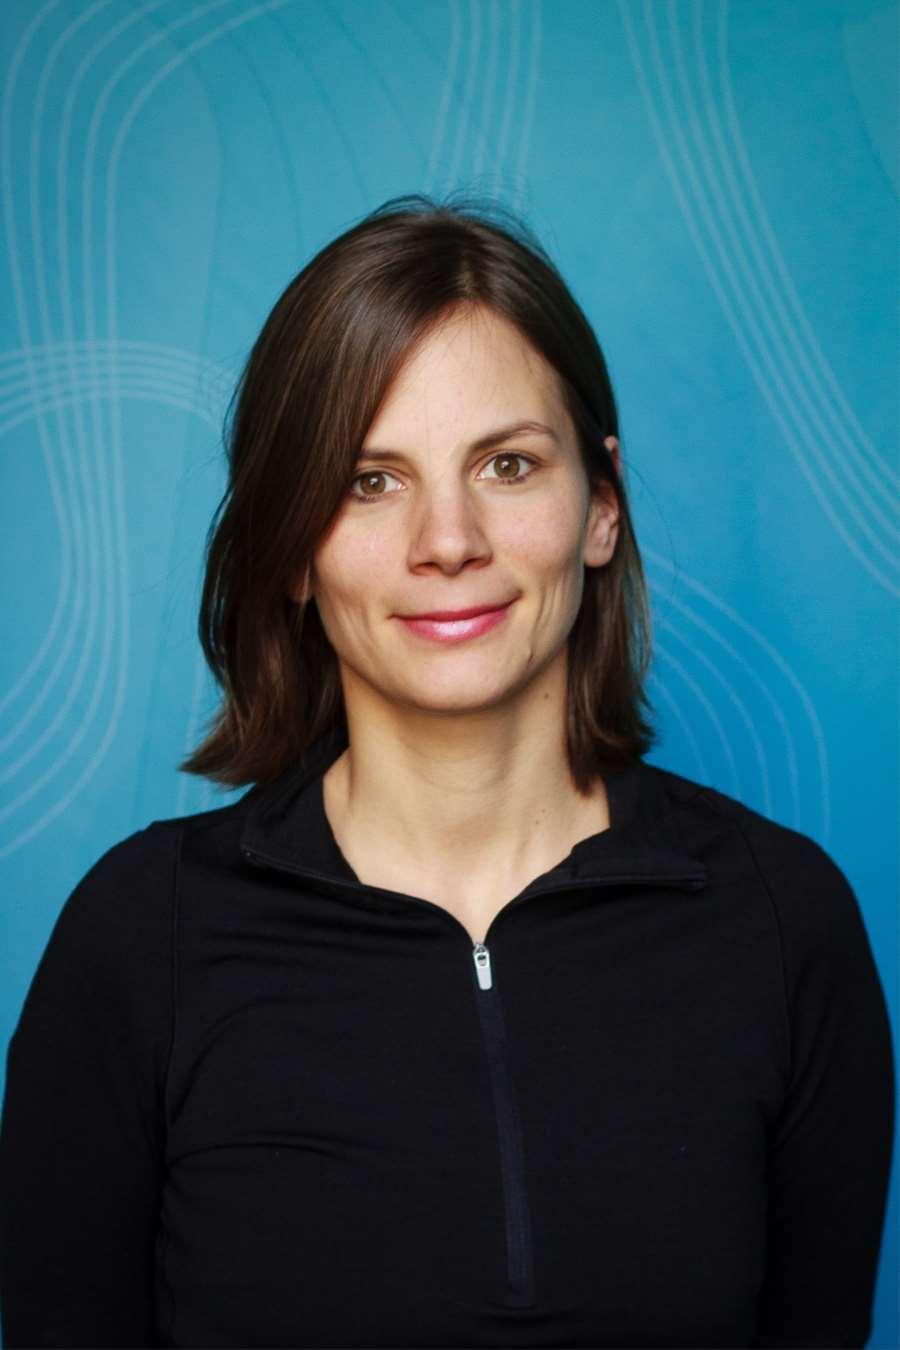 Successful PhD defense by Nina von Uexkull